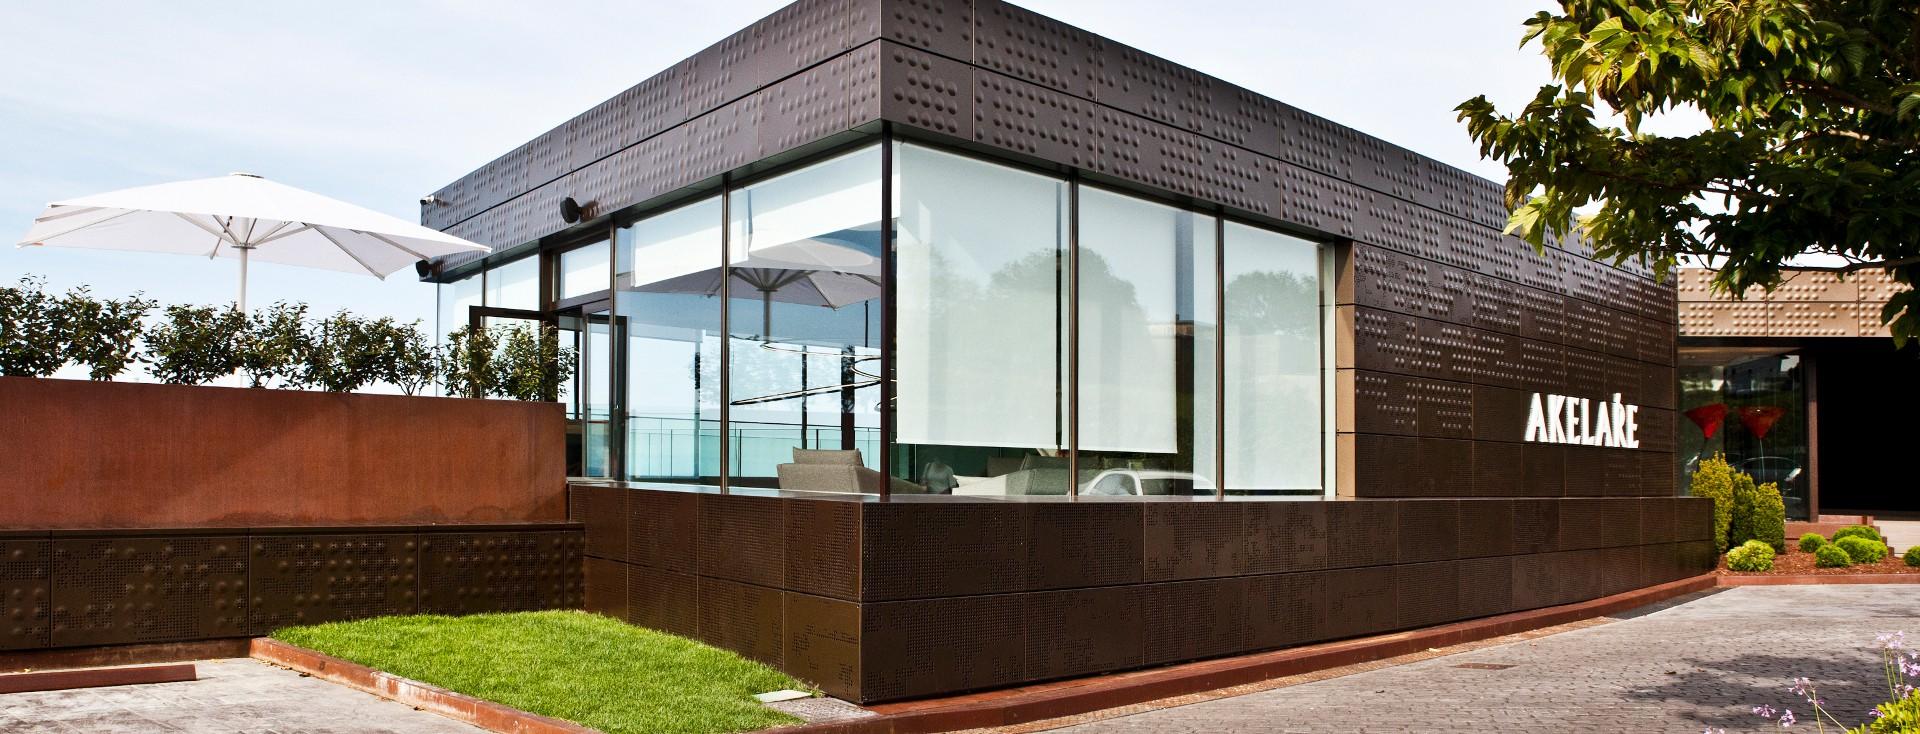 Akelarre – Restaurant & Hotel